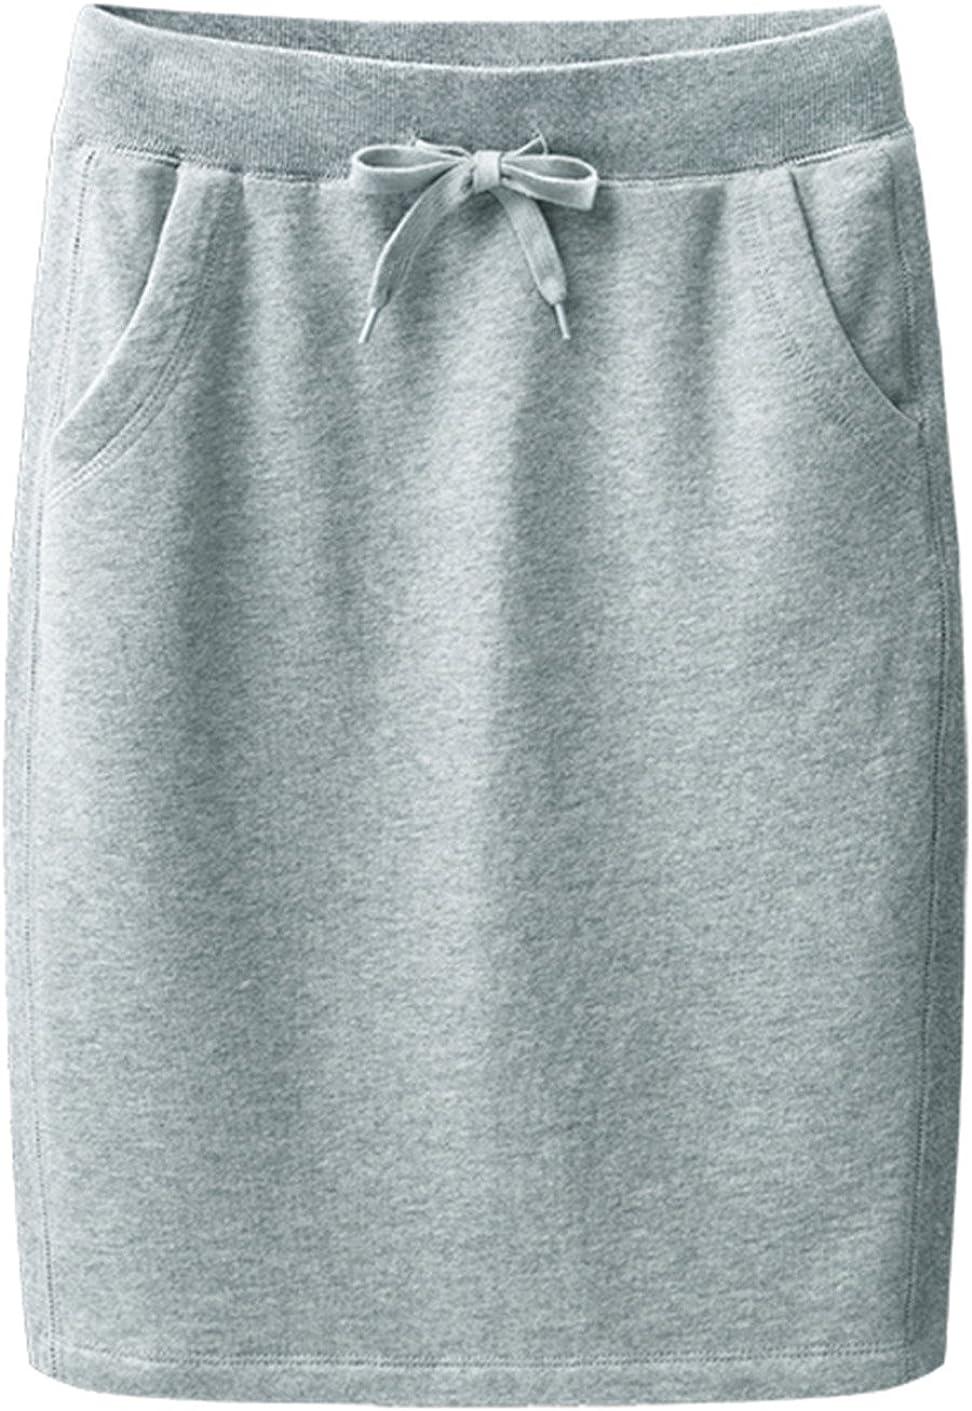 Trendy XU Women Cotton Elastic Waist H-line Skirt Drawstring Waistband Slim Fit Skirts